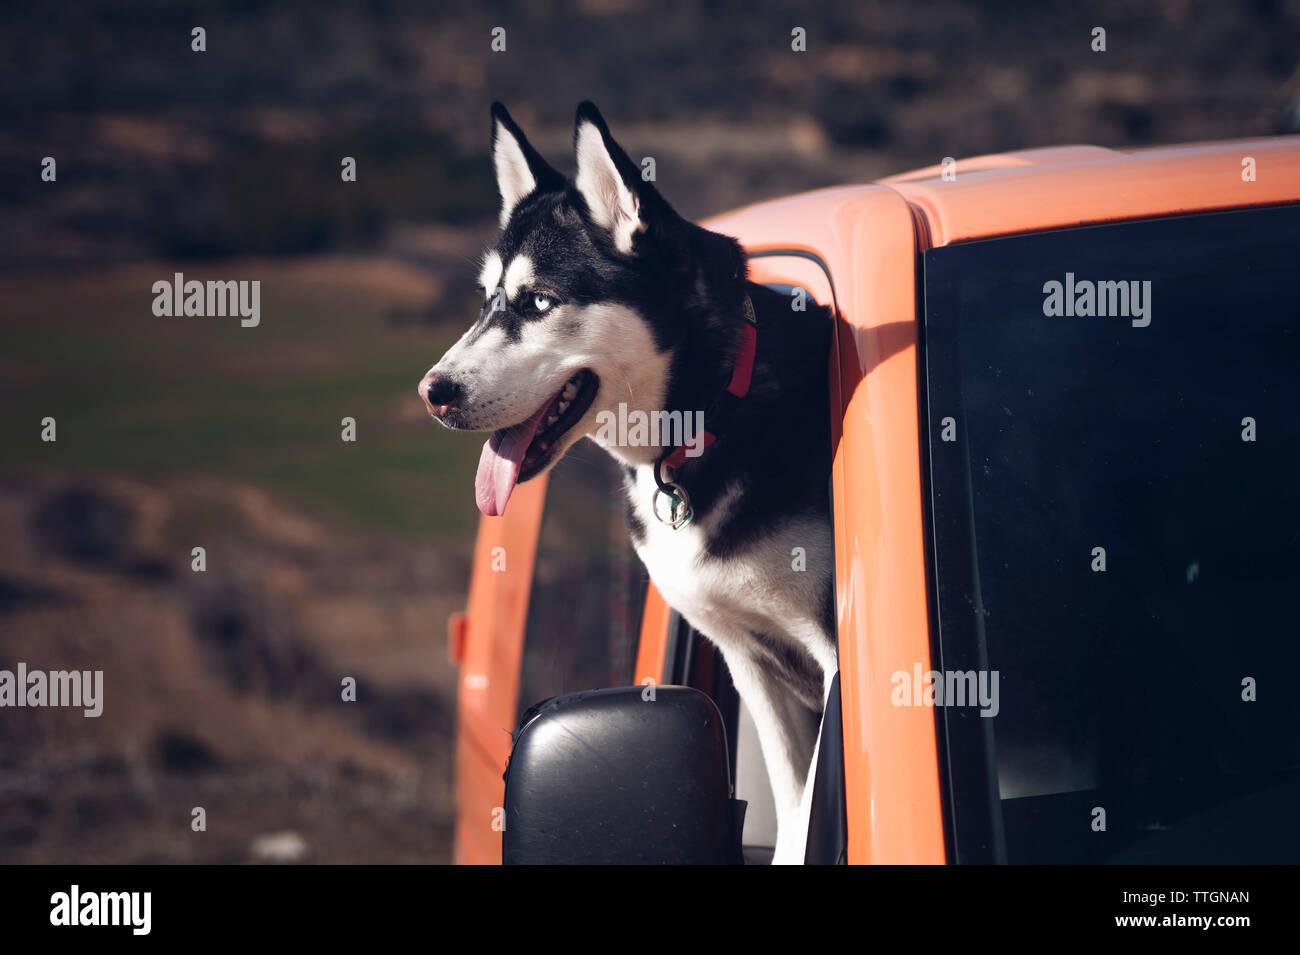 Siberian Husky dog pokes its head out of a car window. - Stock Image